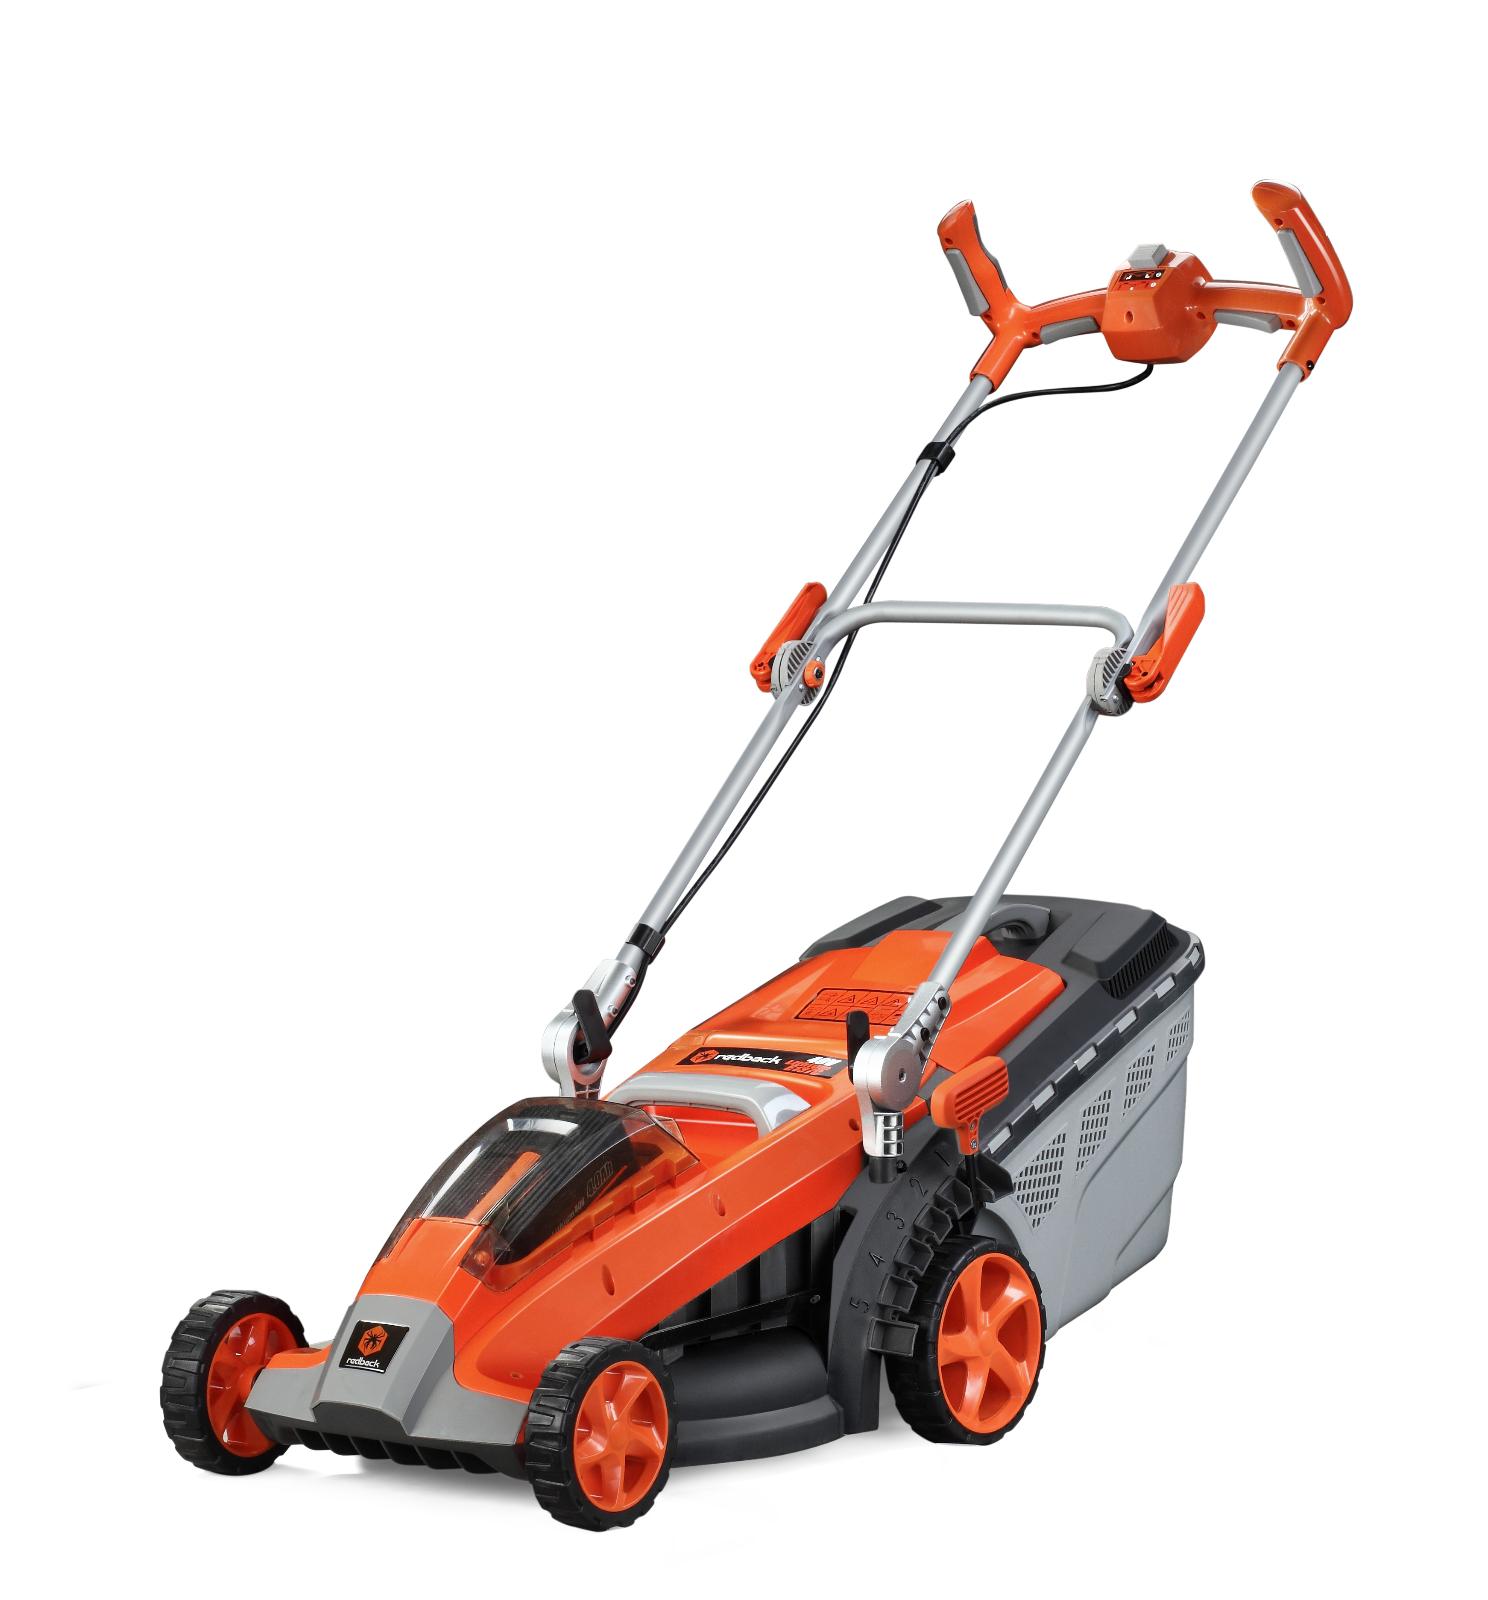 40 Volt Cordless Push Lawn Mower Kit - RedBack